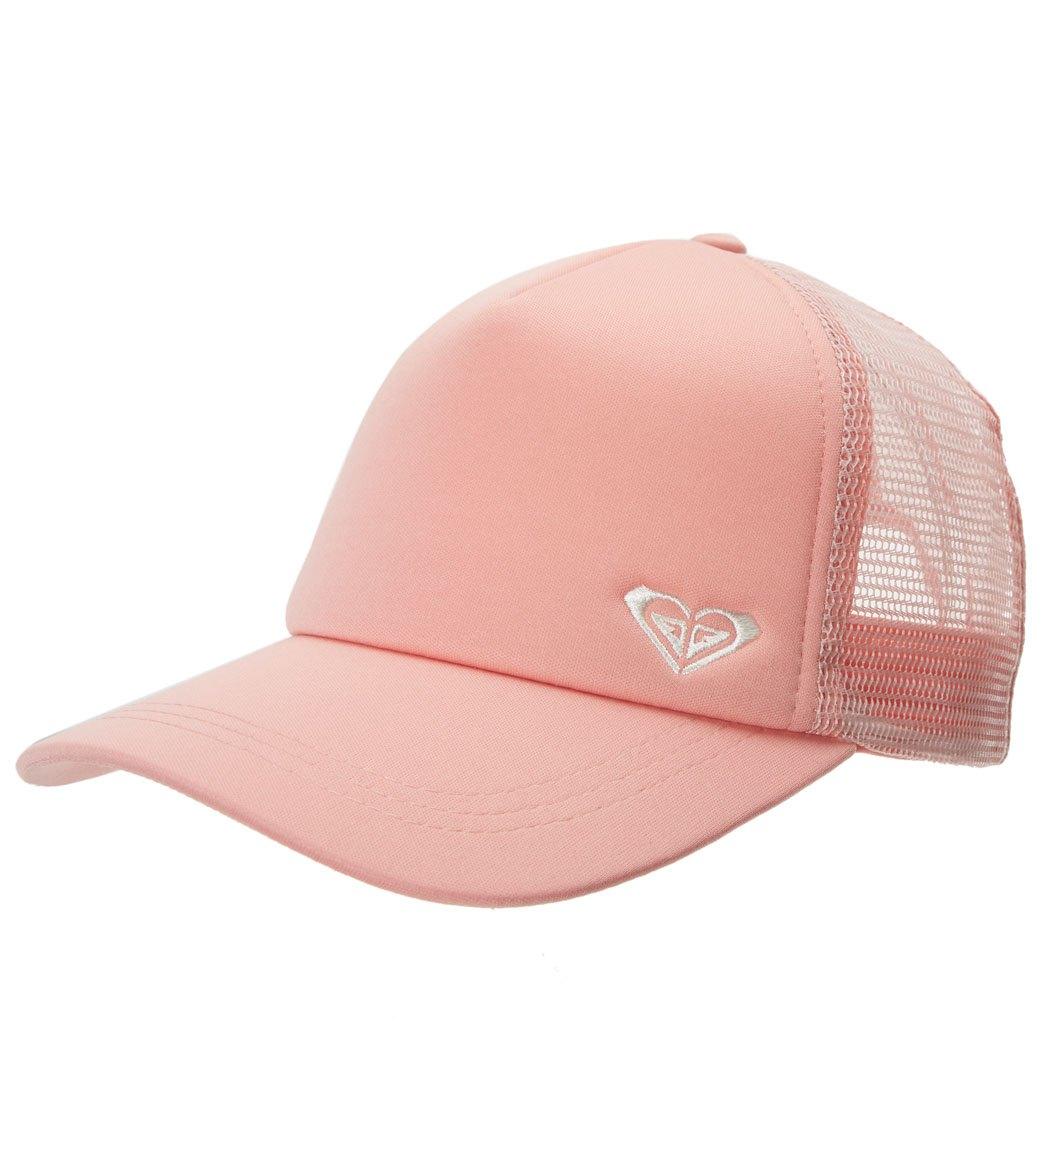 27ccb24d2ab Patagonia - Pastel P-6 Label Layback Trucker Hat - Women s - Light Violet  Blue